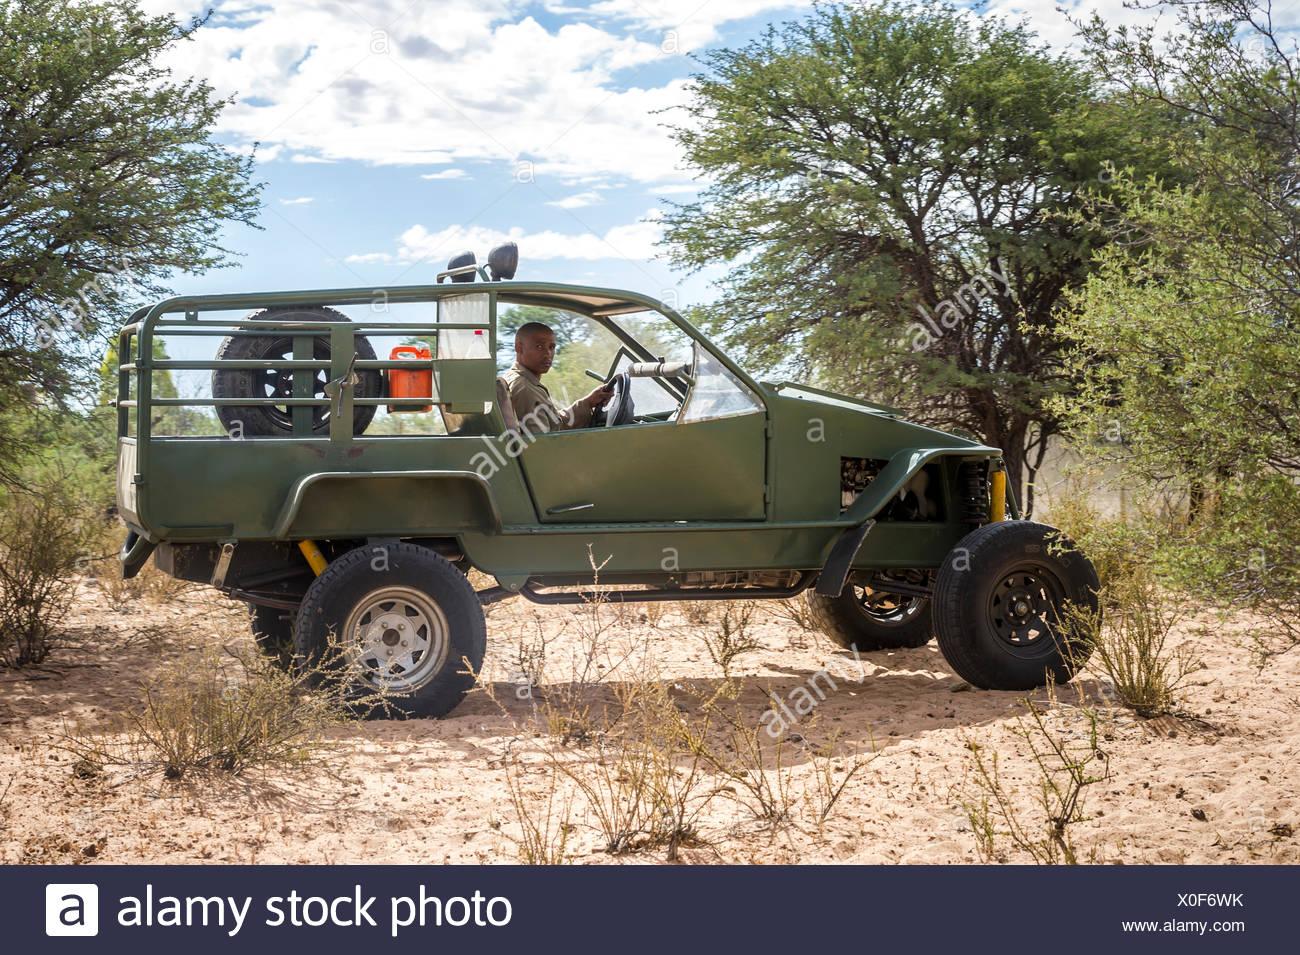 Dune Buggy Stock Photos & Dune Buggy Stock Images - Alamy